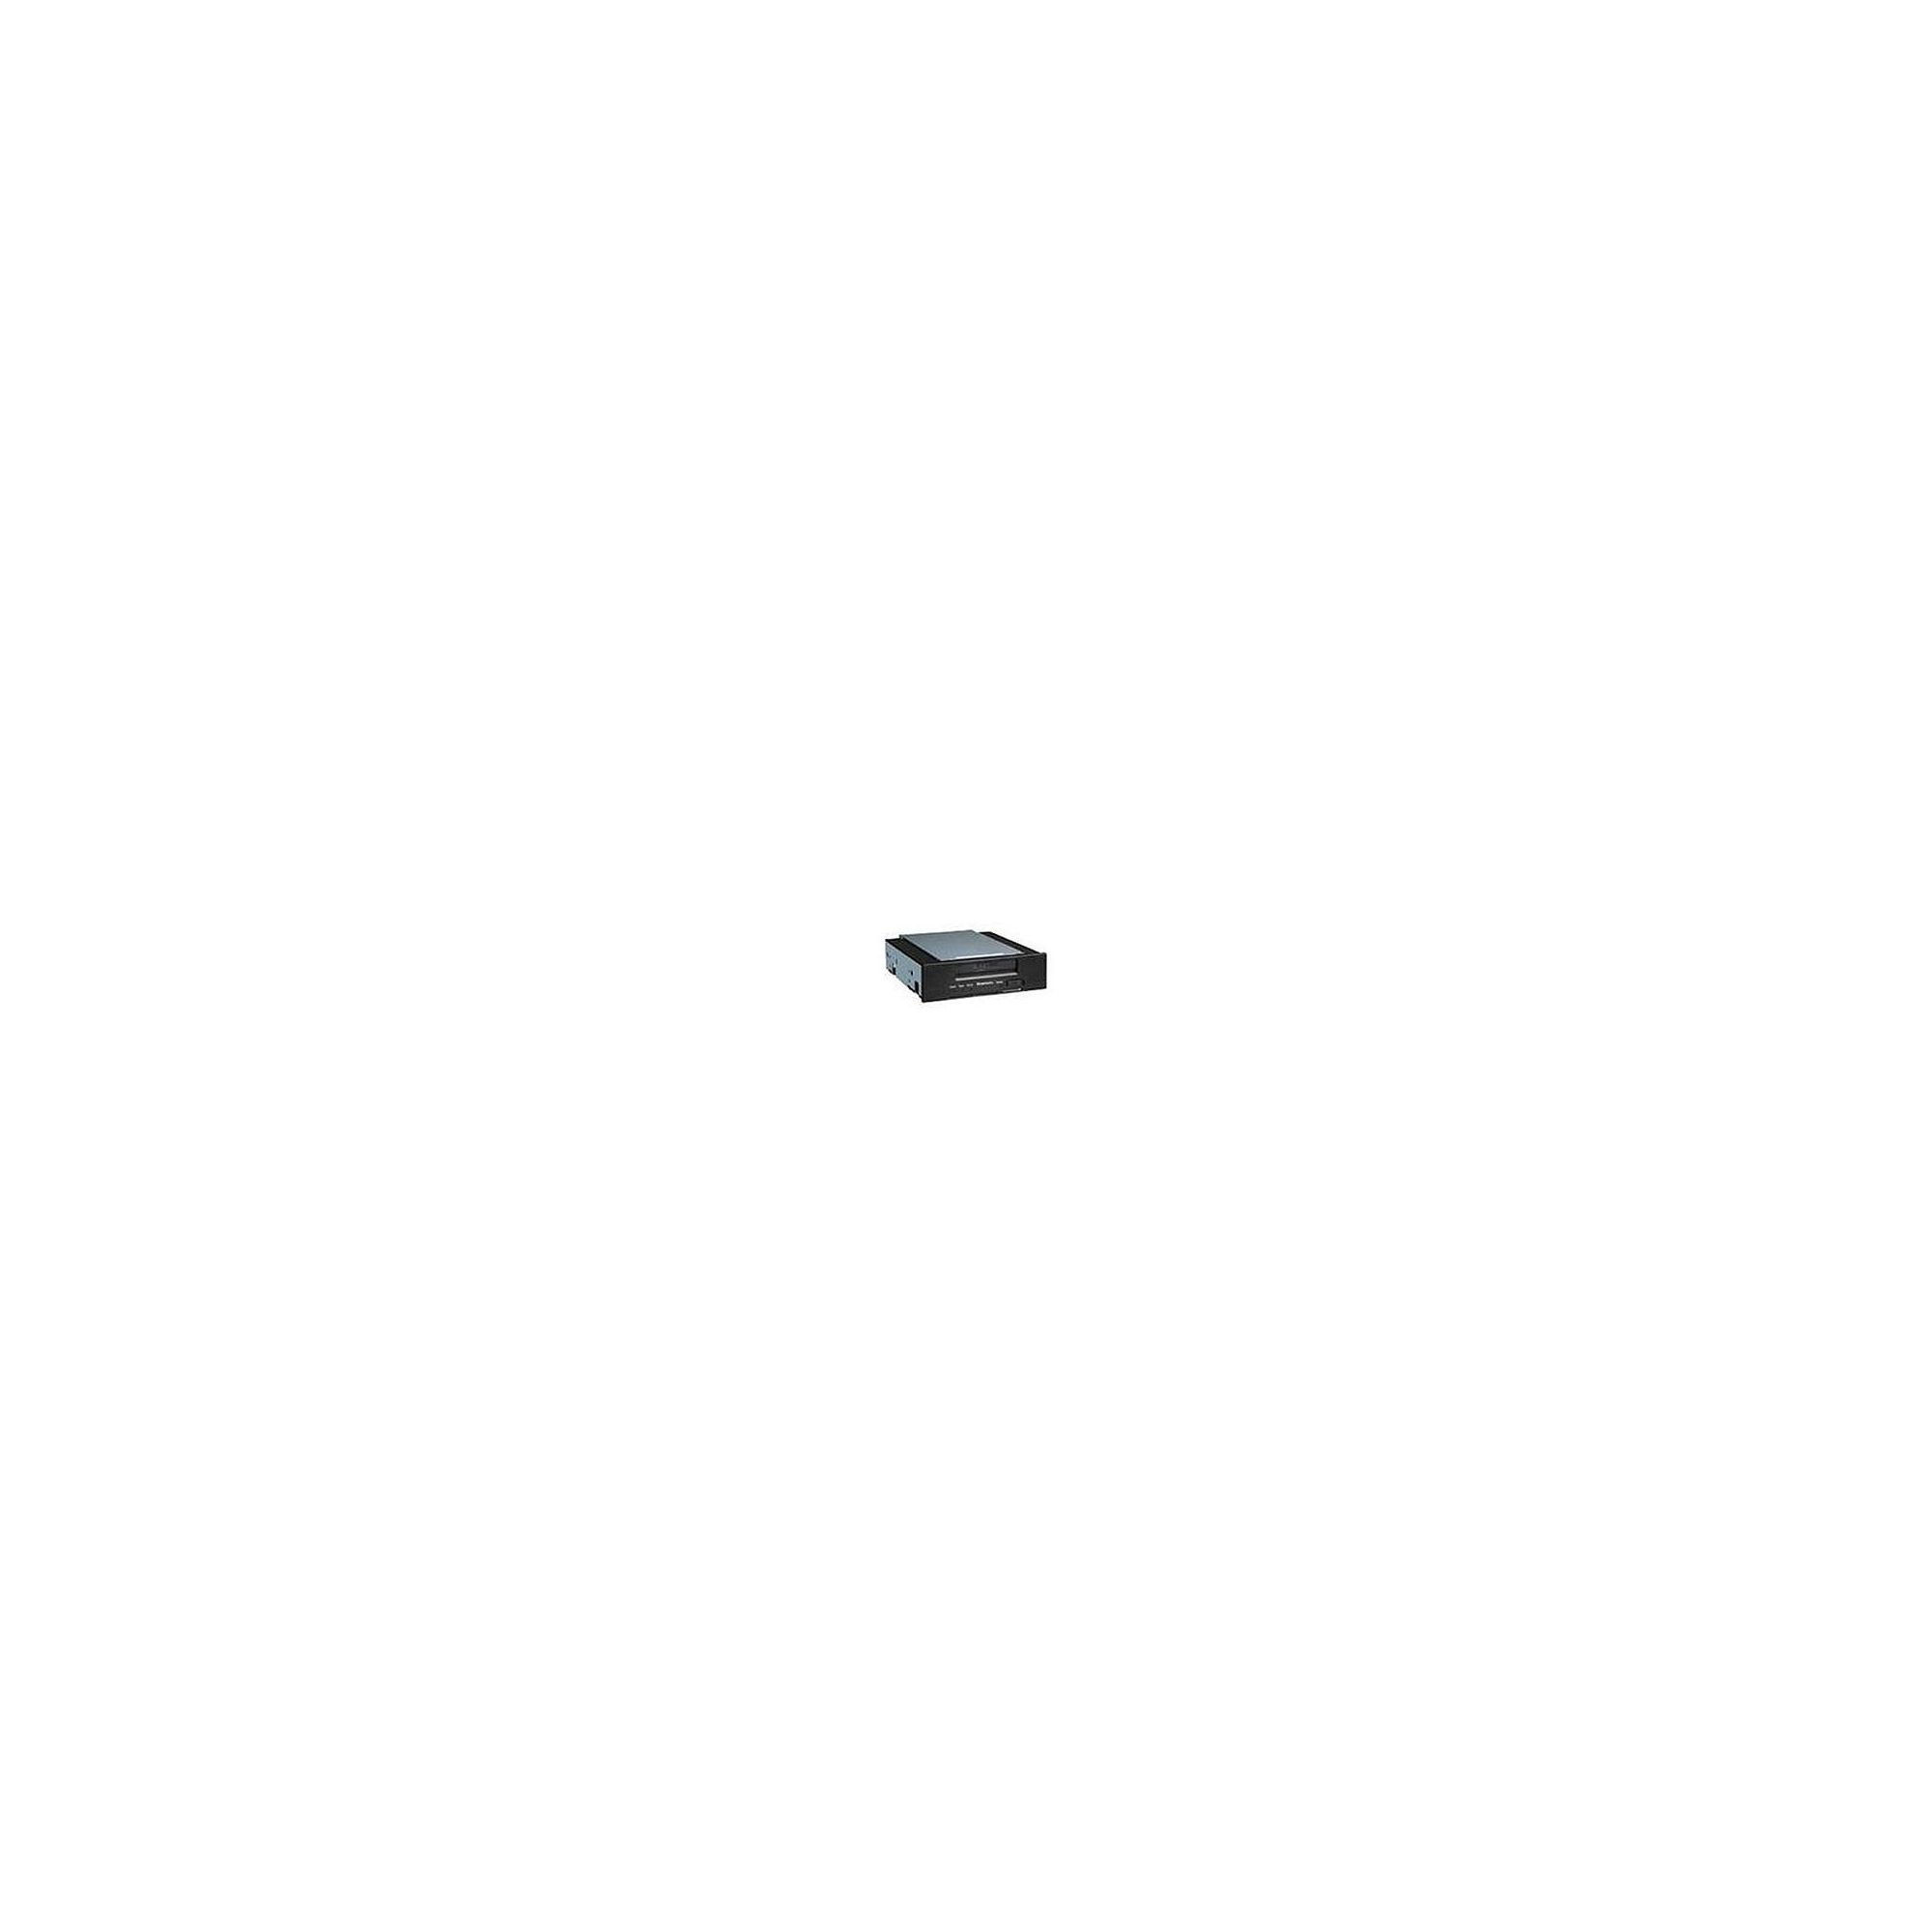 Quantum DAT 160 5.25 inch Tape Drive USB 2.0 Internal Bare Drive (Black) at Tesco Direct